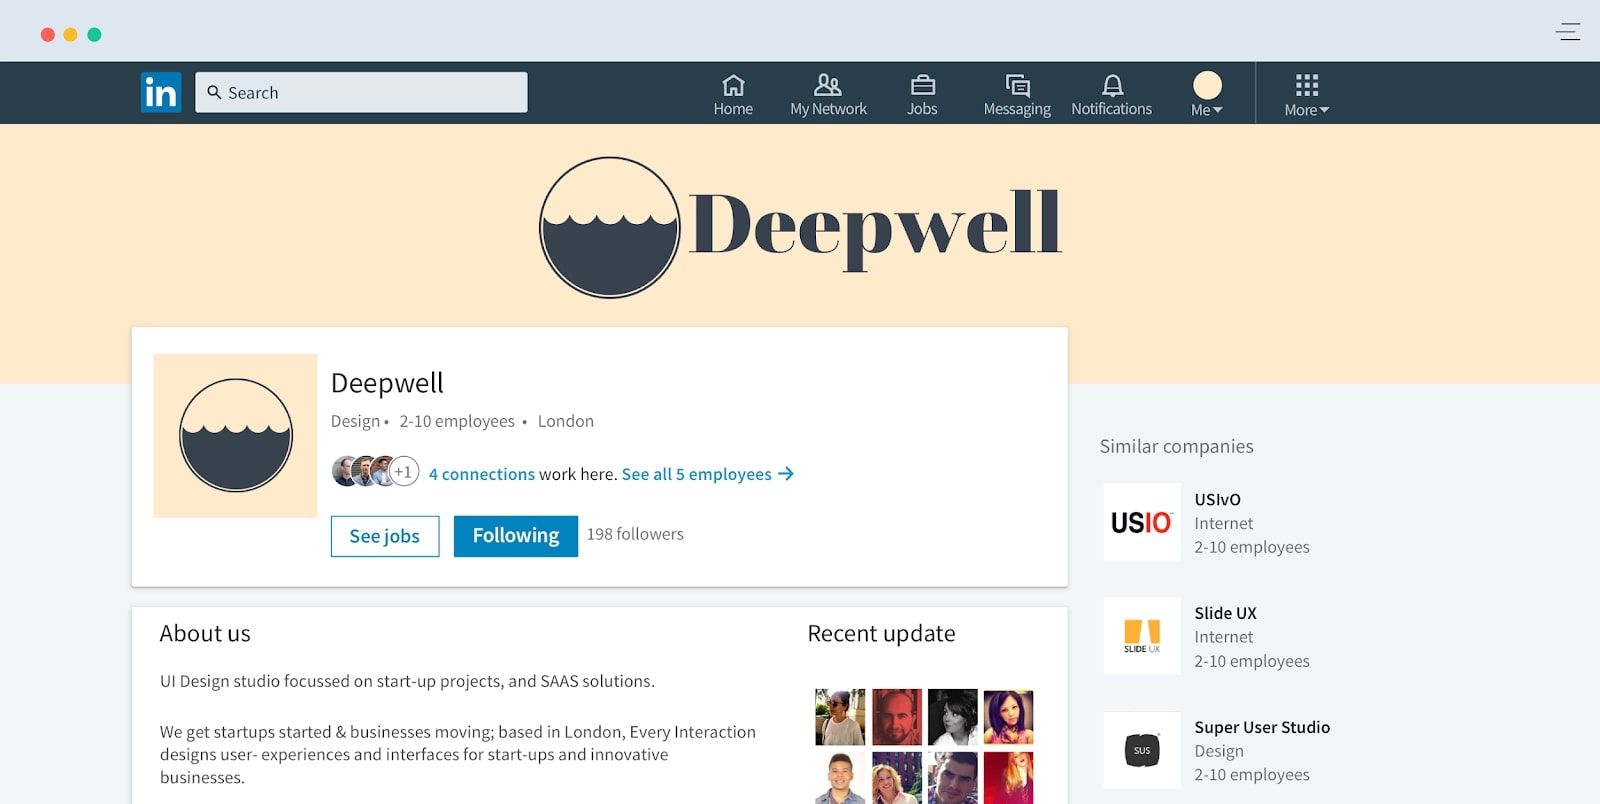 Deepwell Linkedin profile